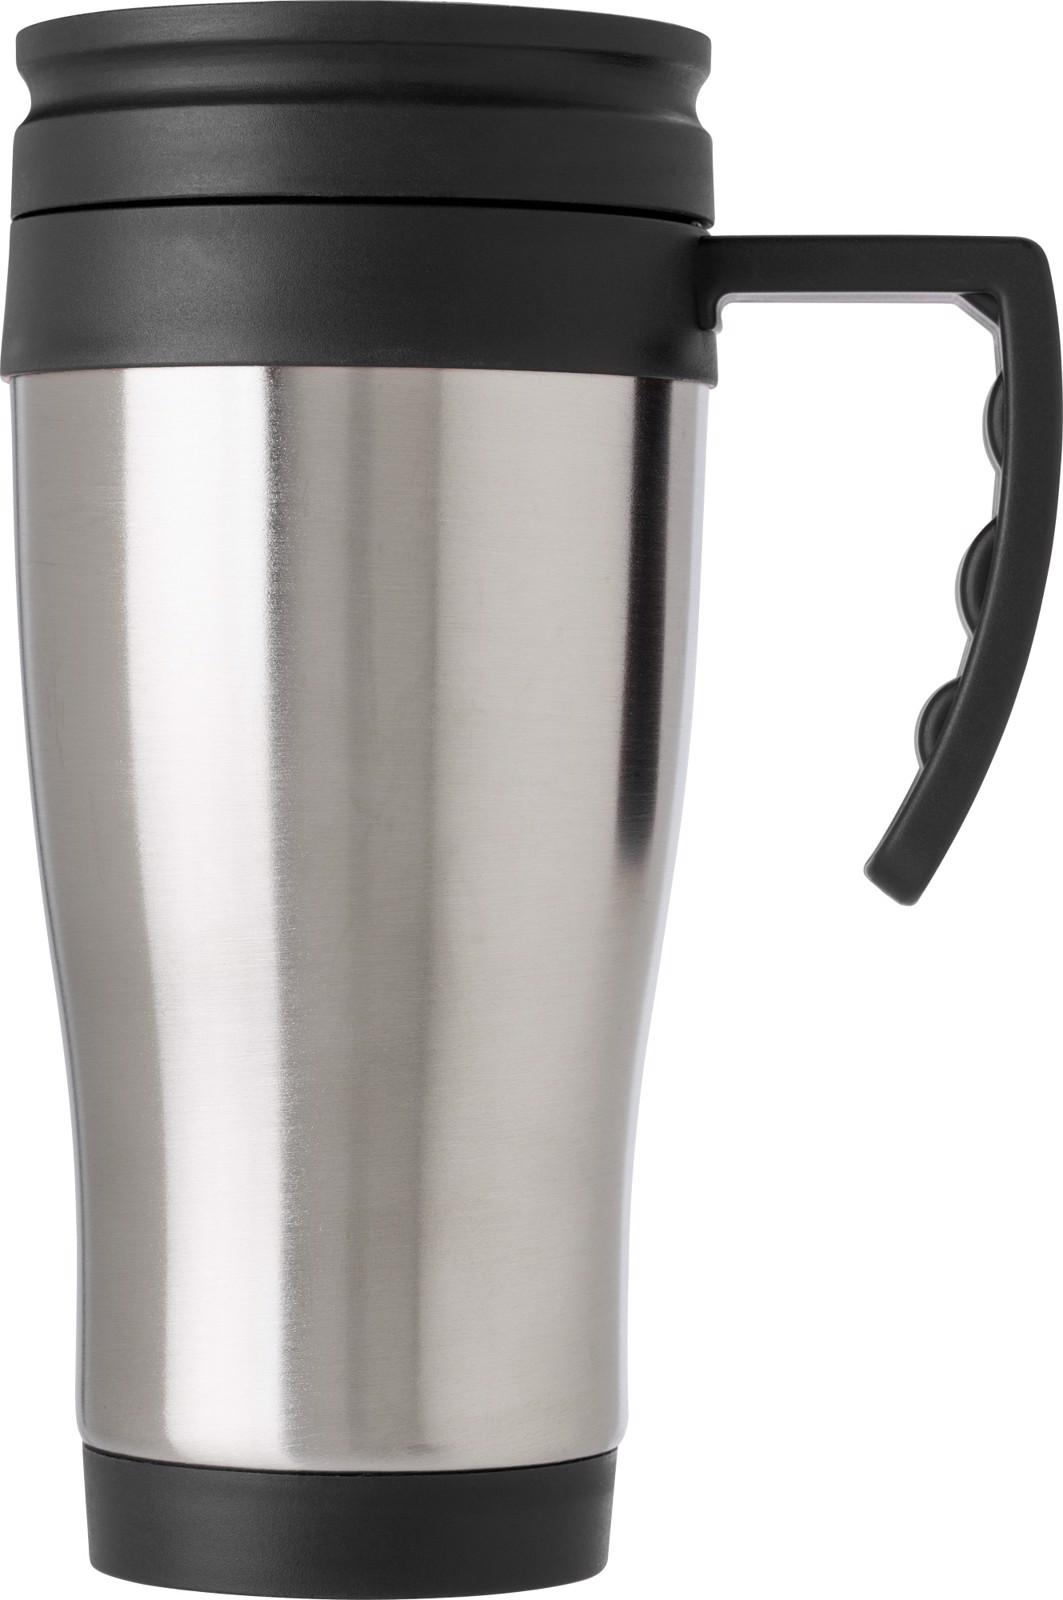 Stainless steel travel mug - Silver